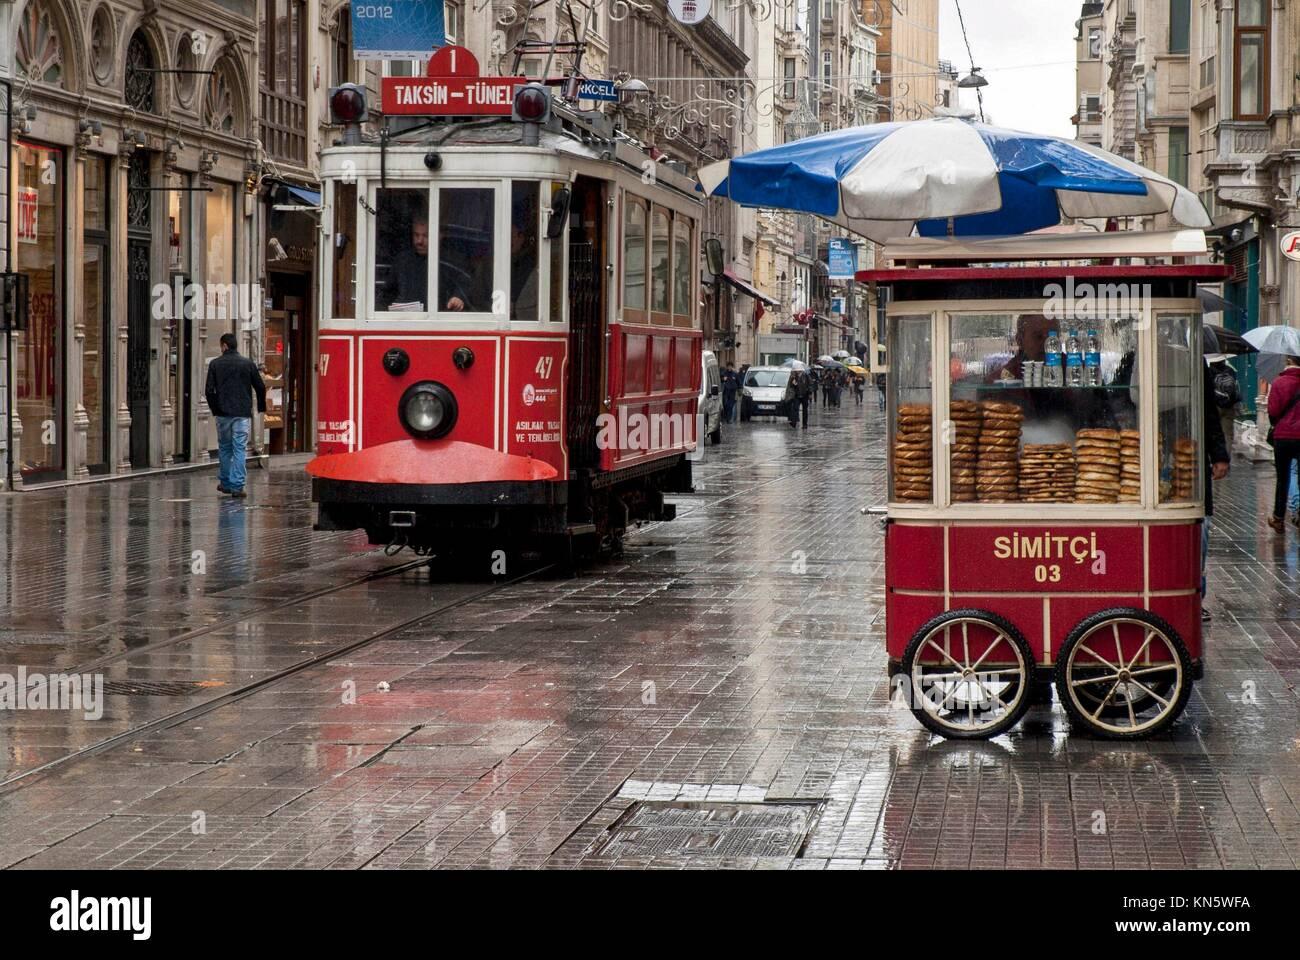 Estambul Stock Photos & Estambul Stock Images - Alamy